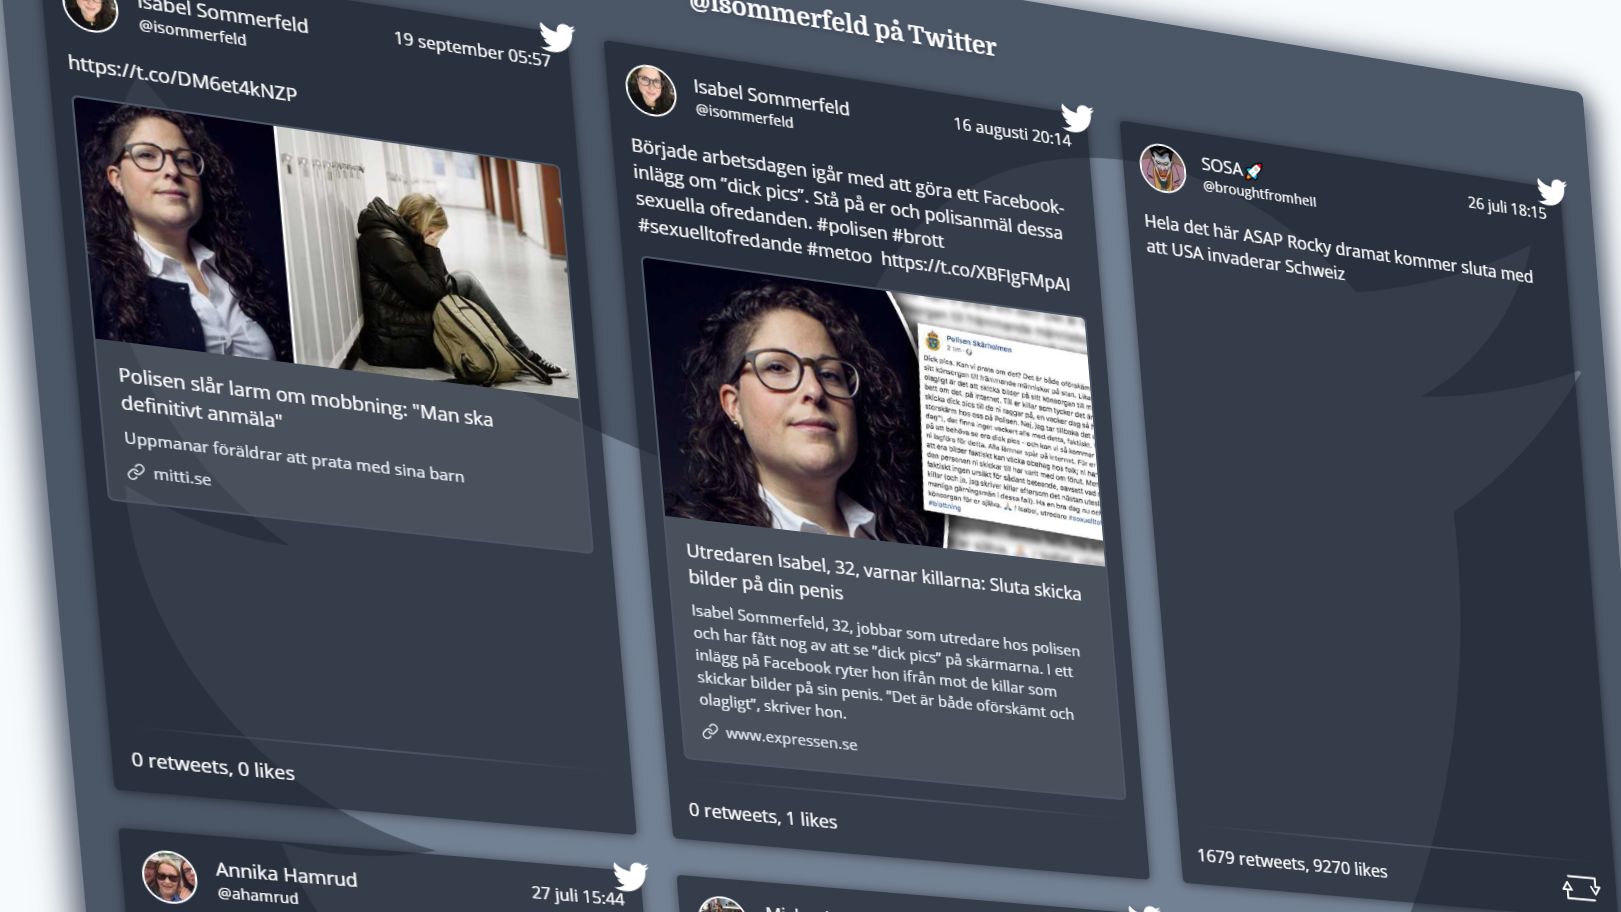 Skewed screenshot of resulting Tweets section of web page.